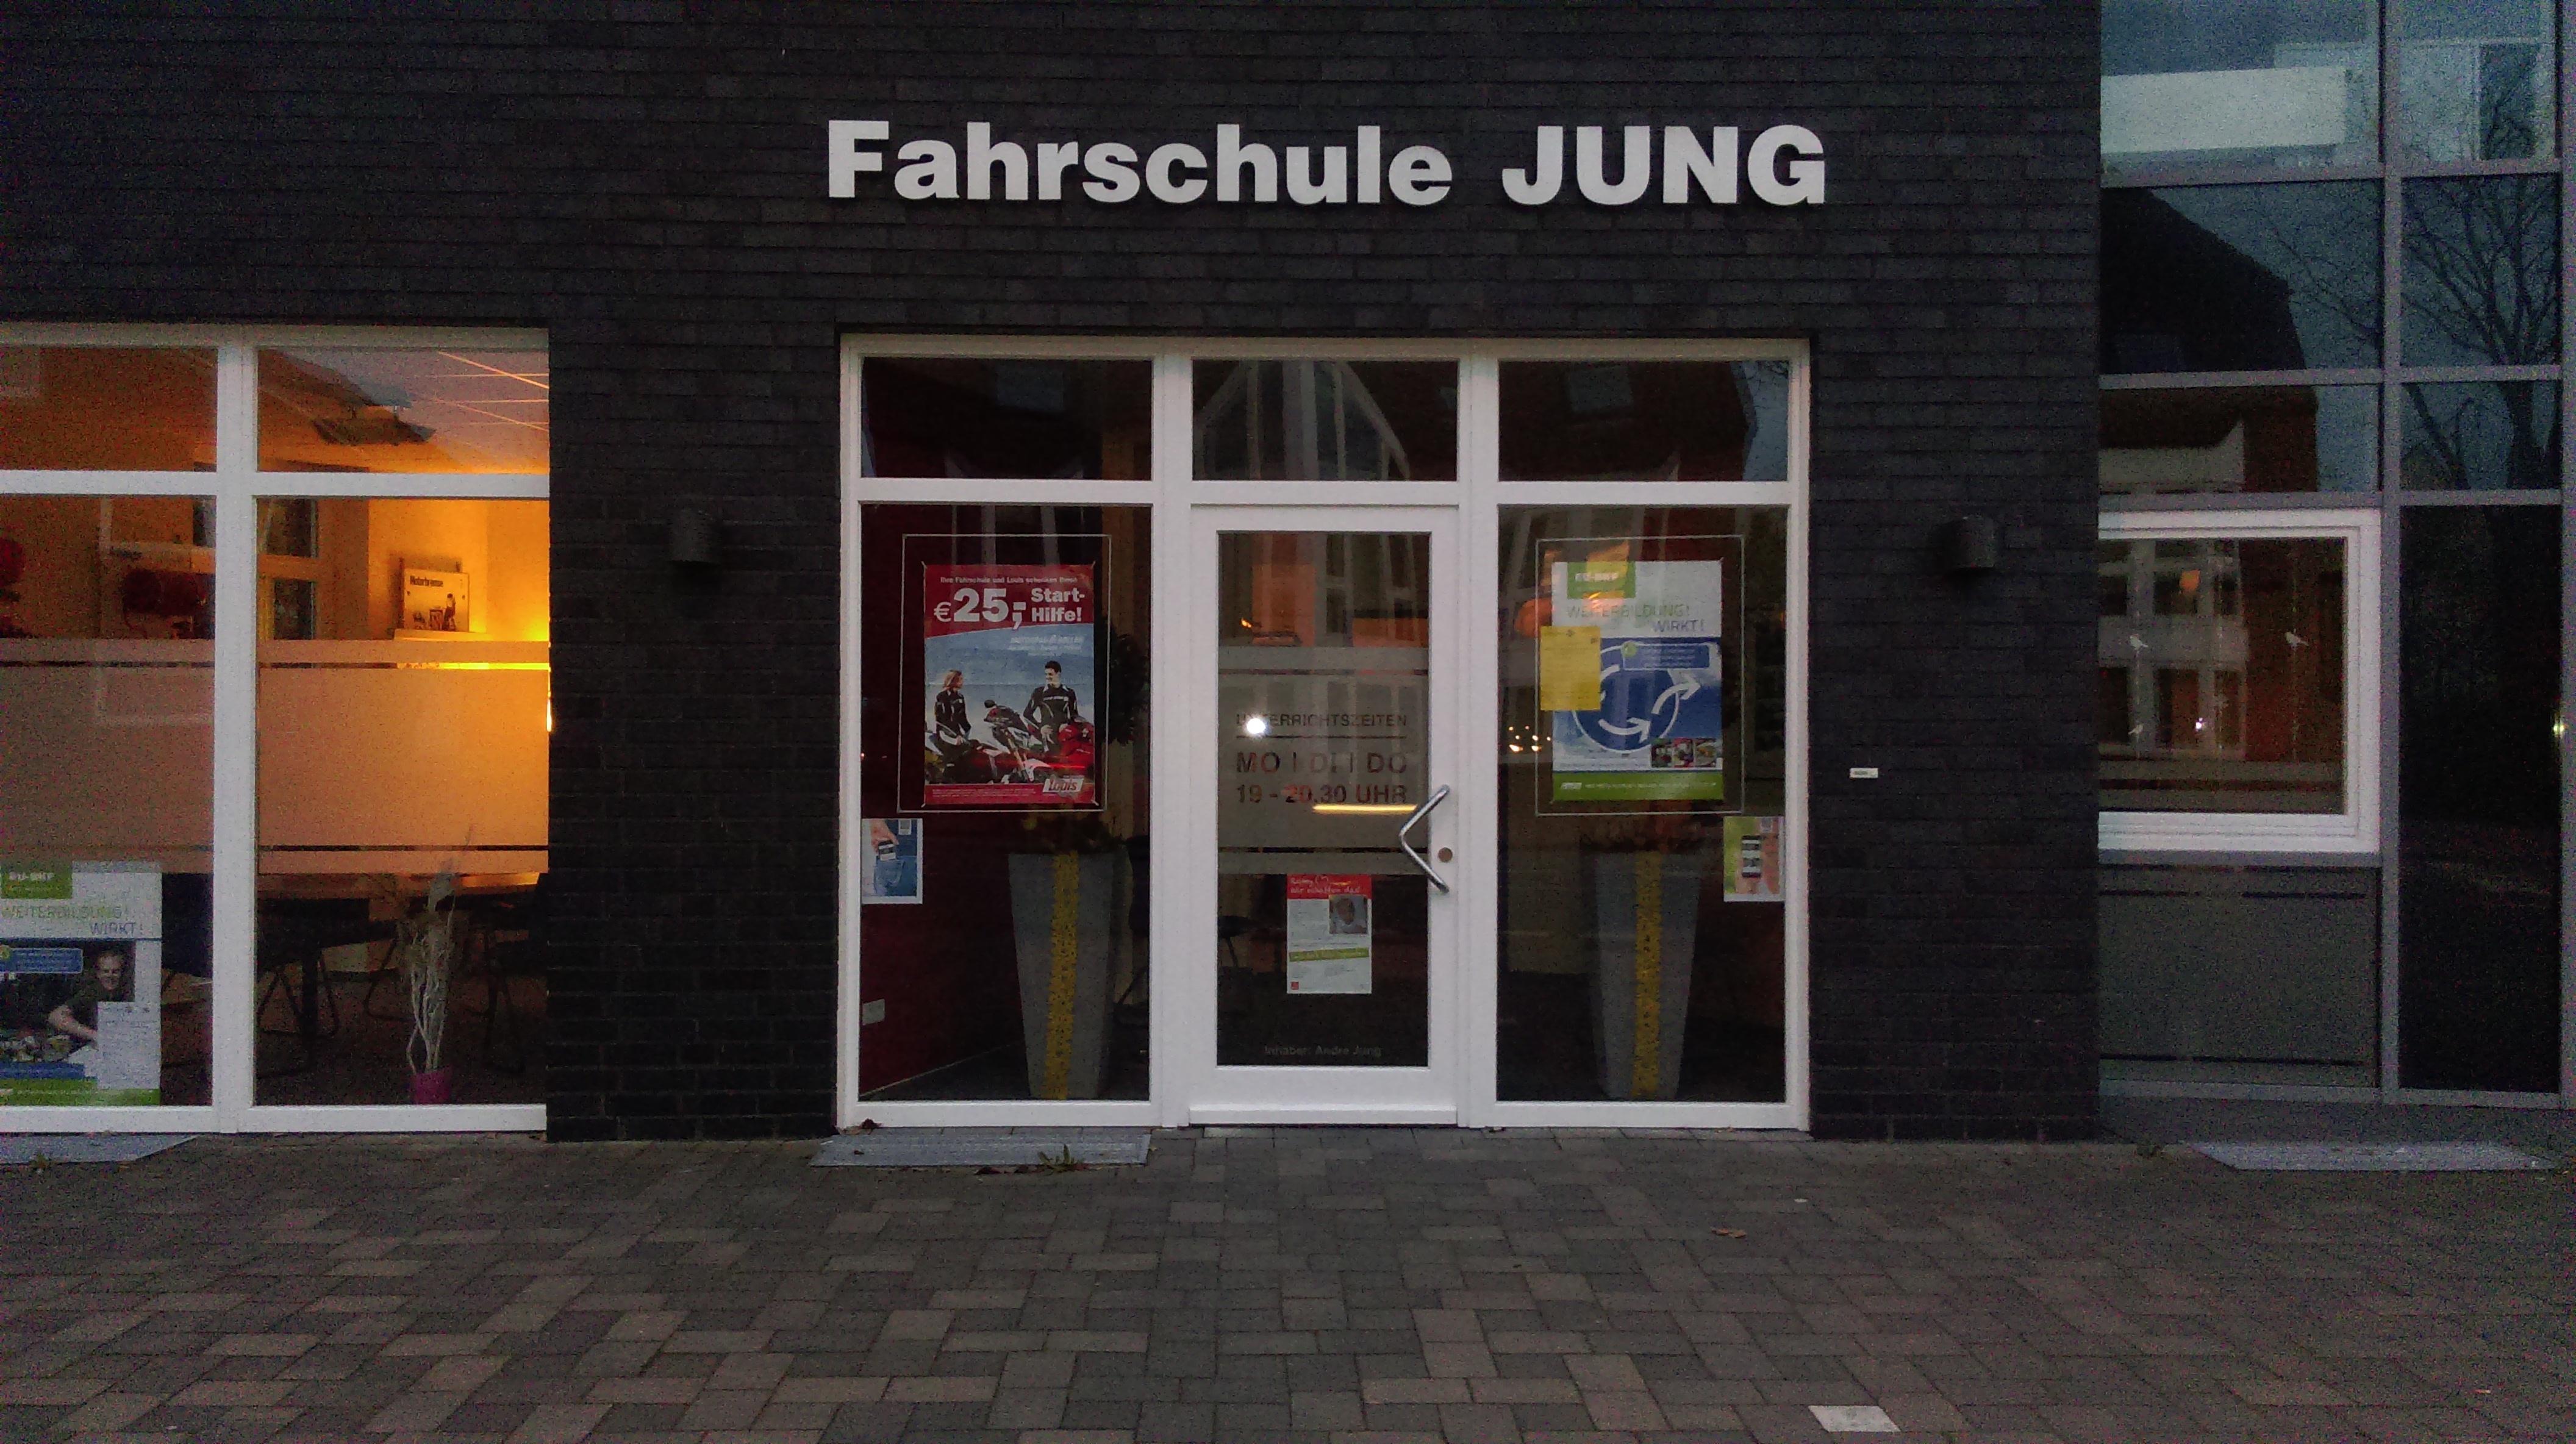 Wiedereinstieg? Klaus Jung hilft gerne! | Fahrschule JUNG